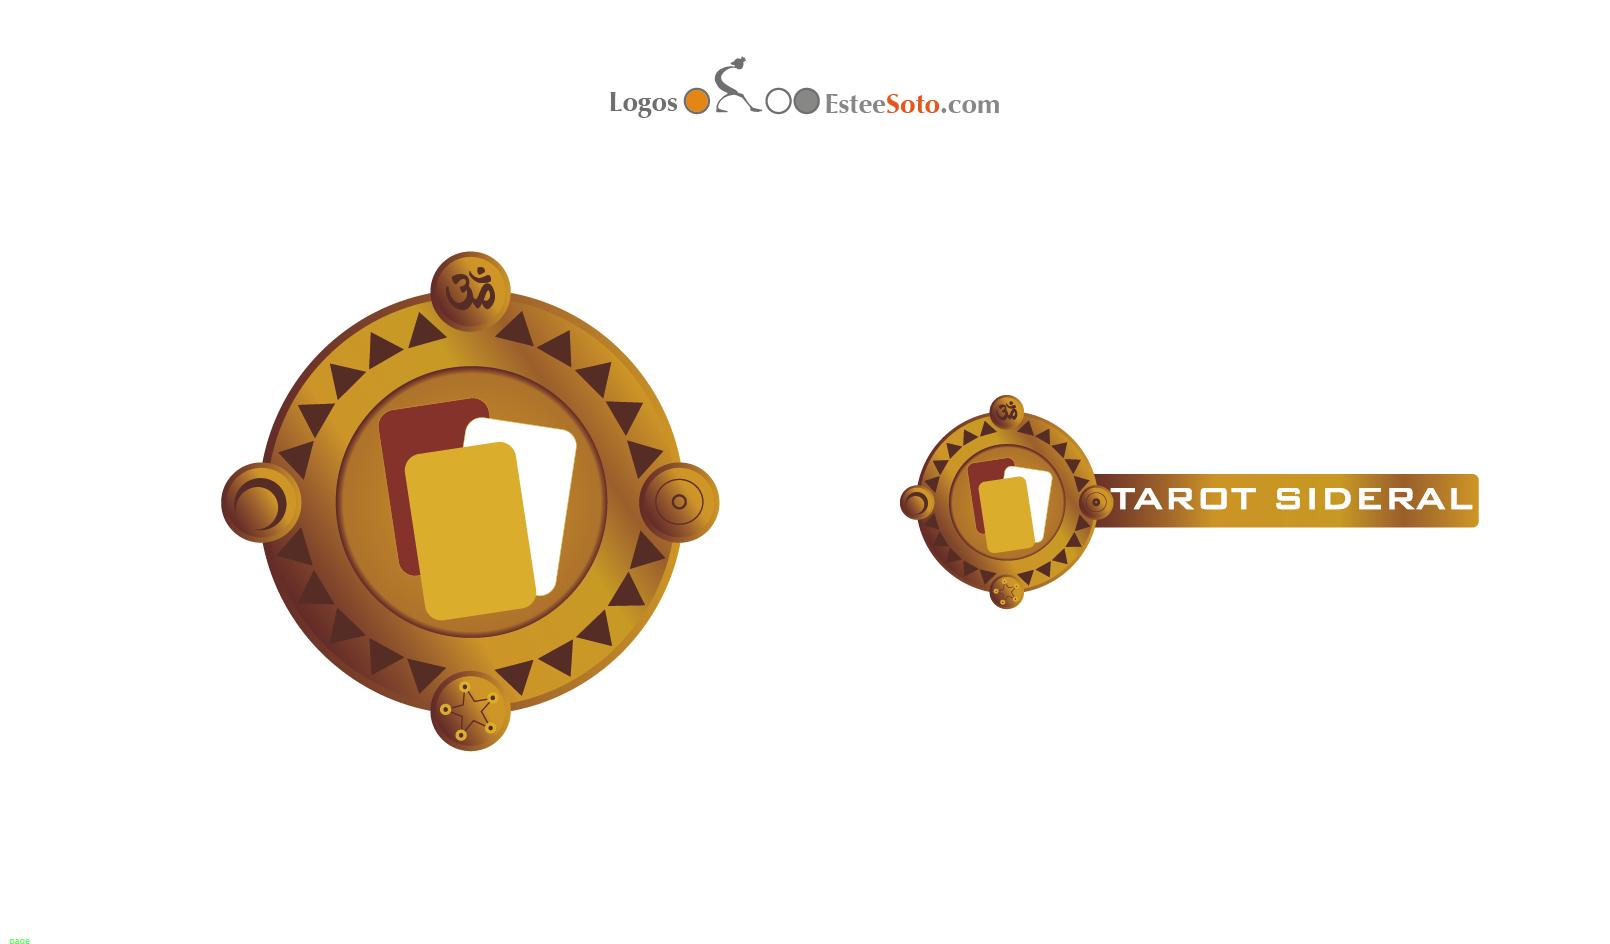 Tarot Sideral